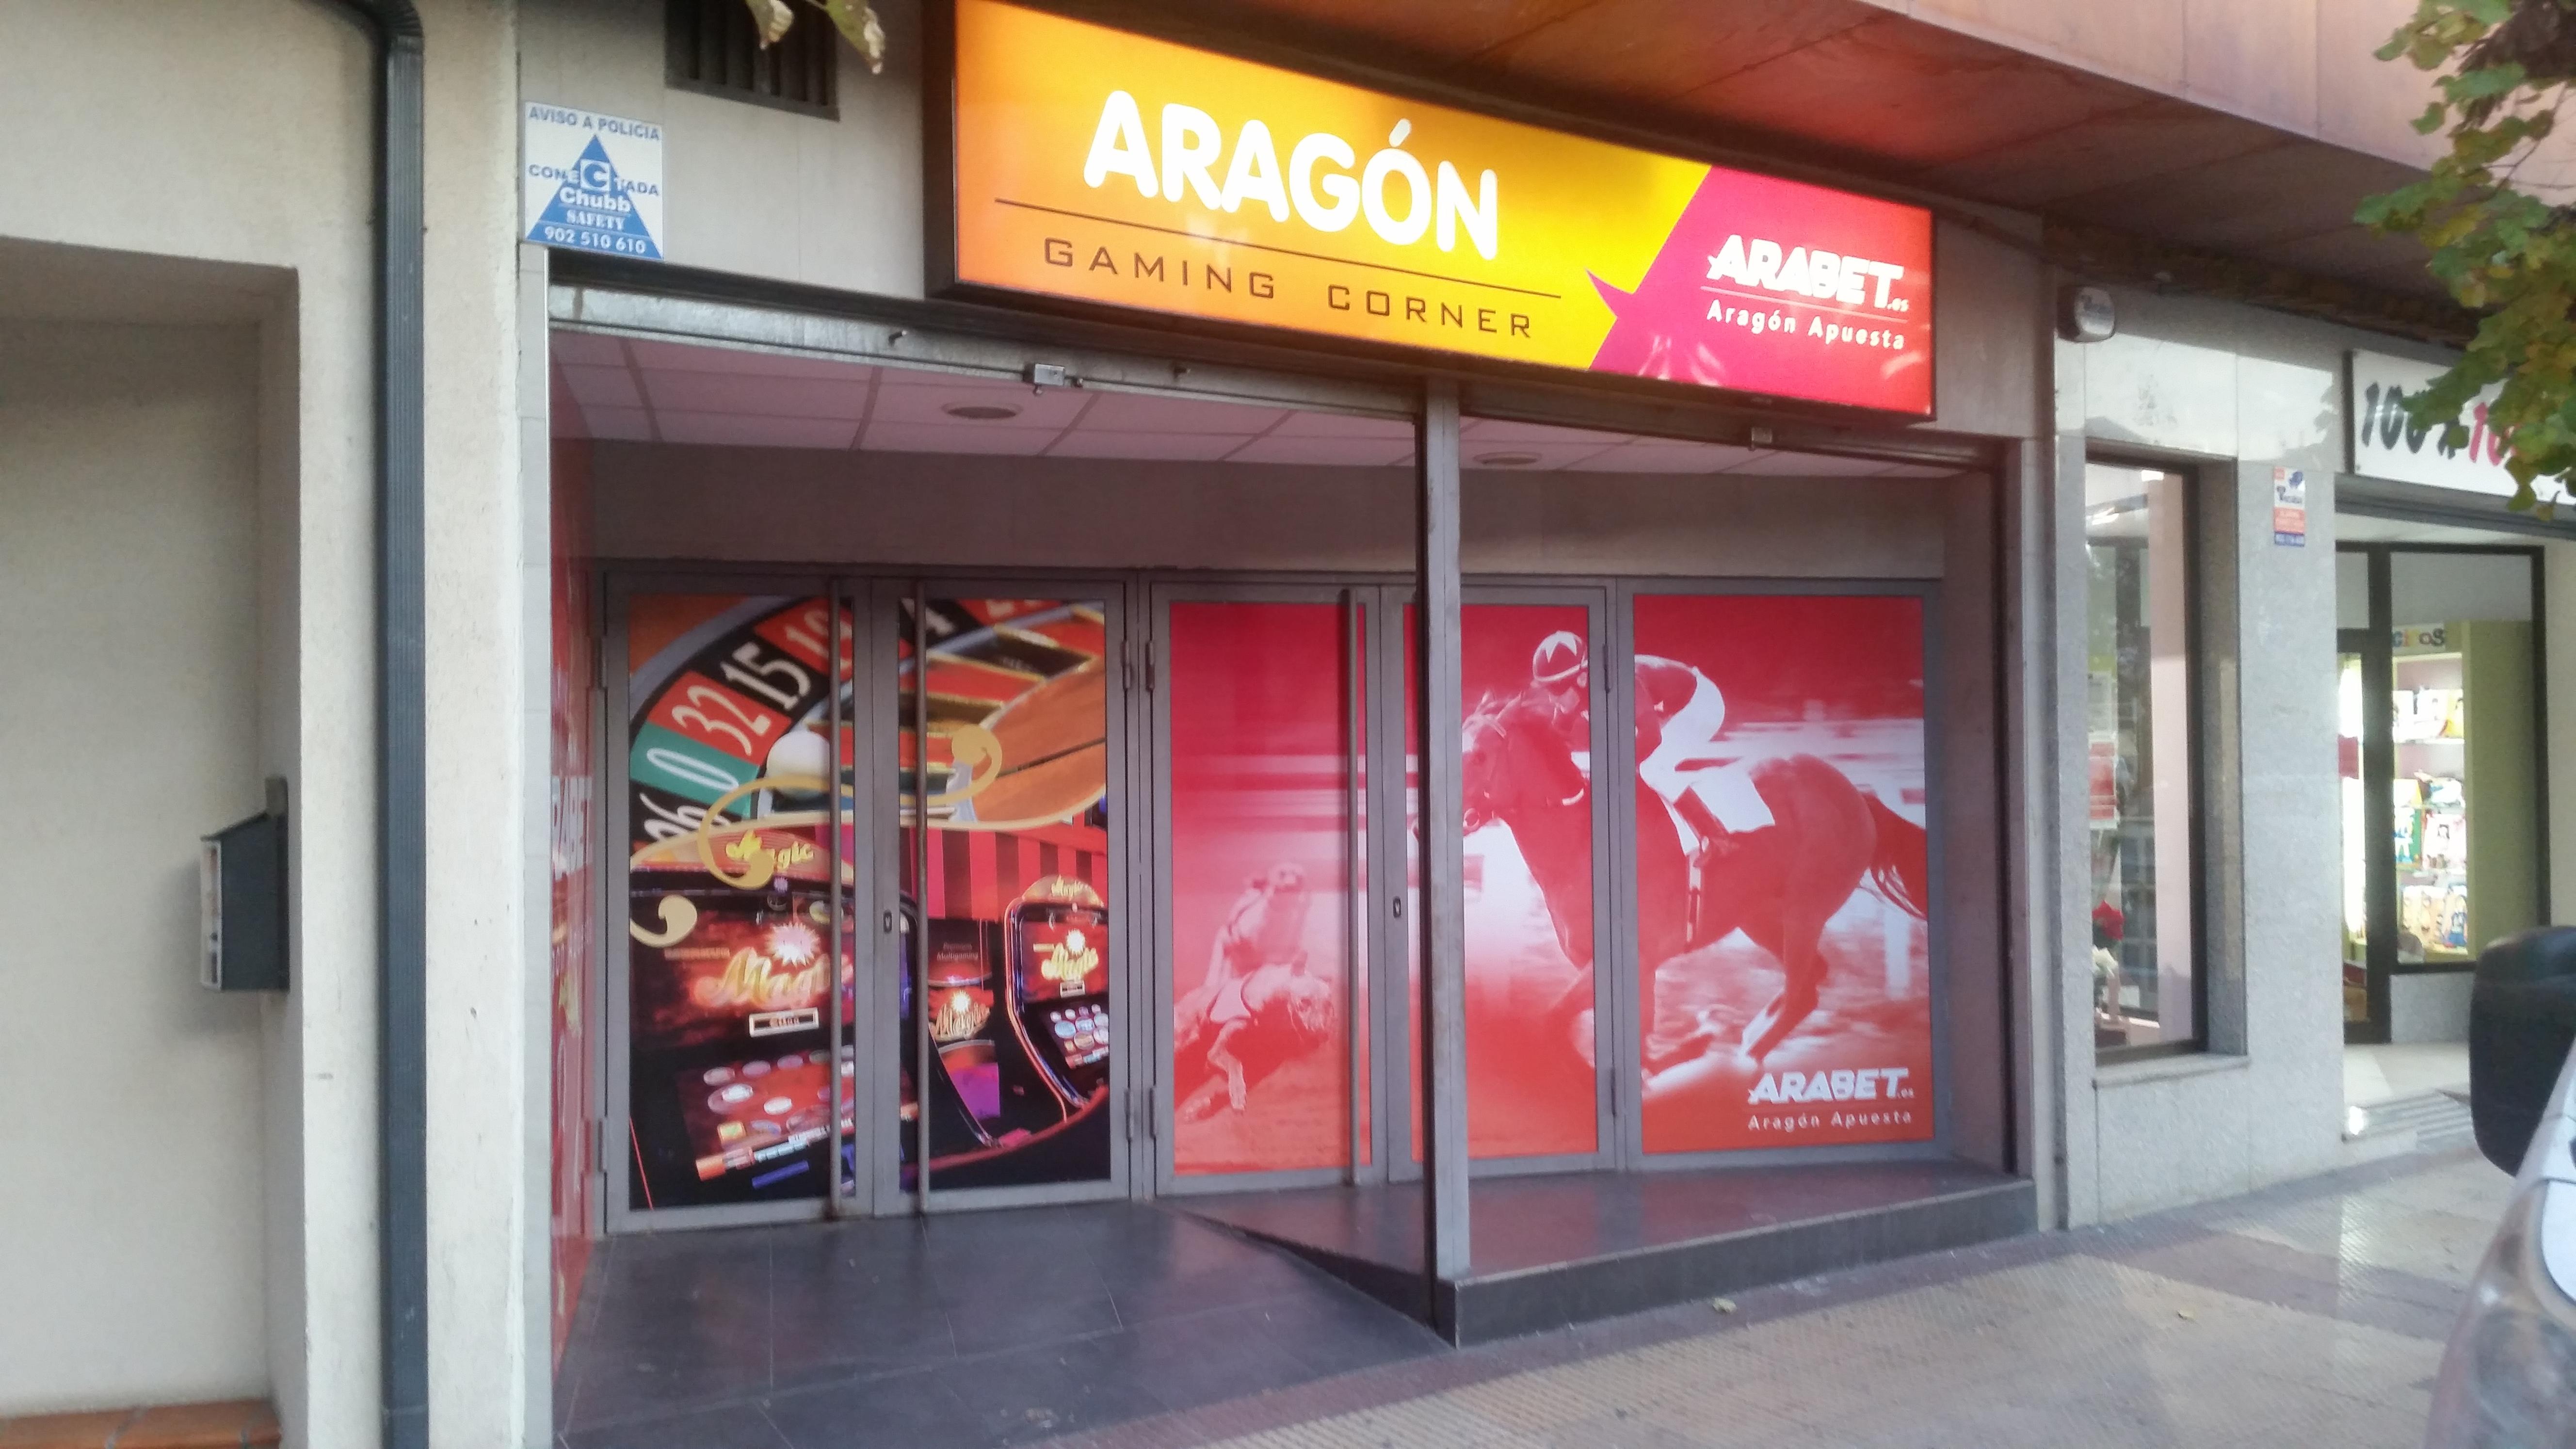 arabet-aragon-apuestas-alcañiz-teruel-4